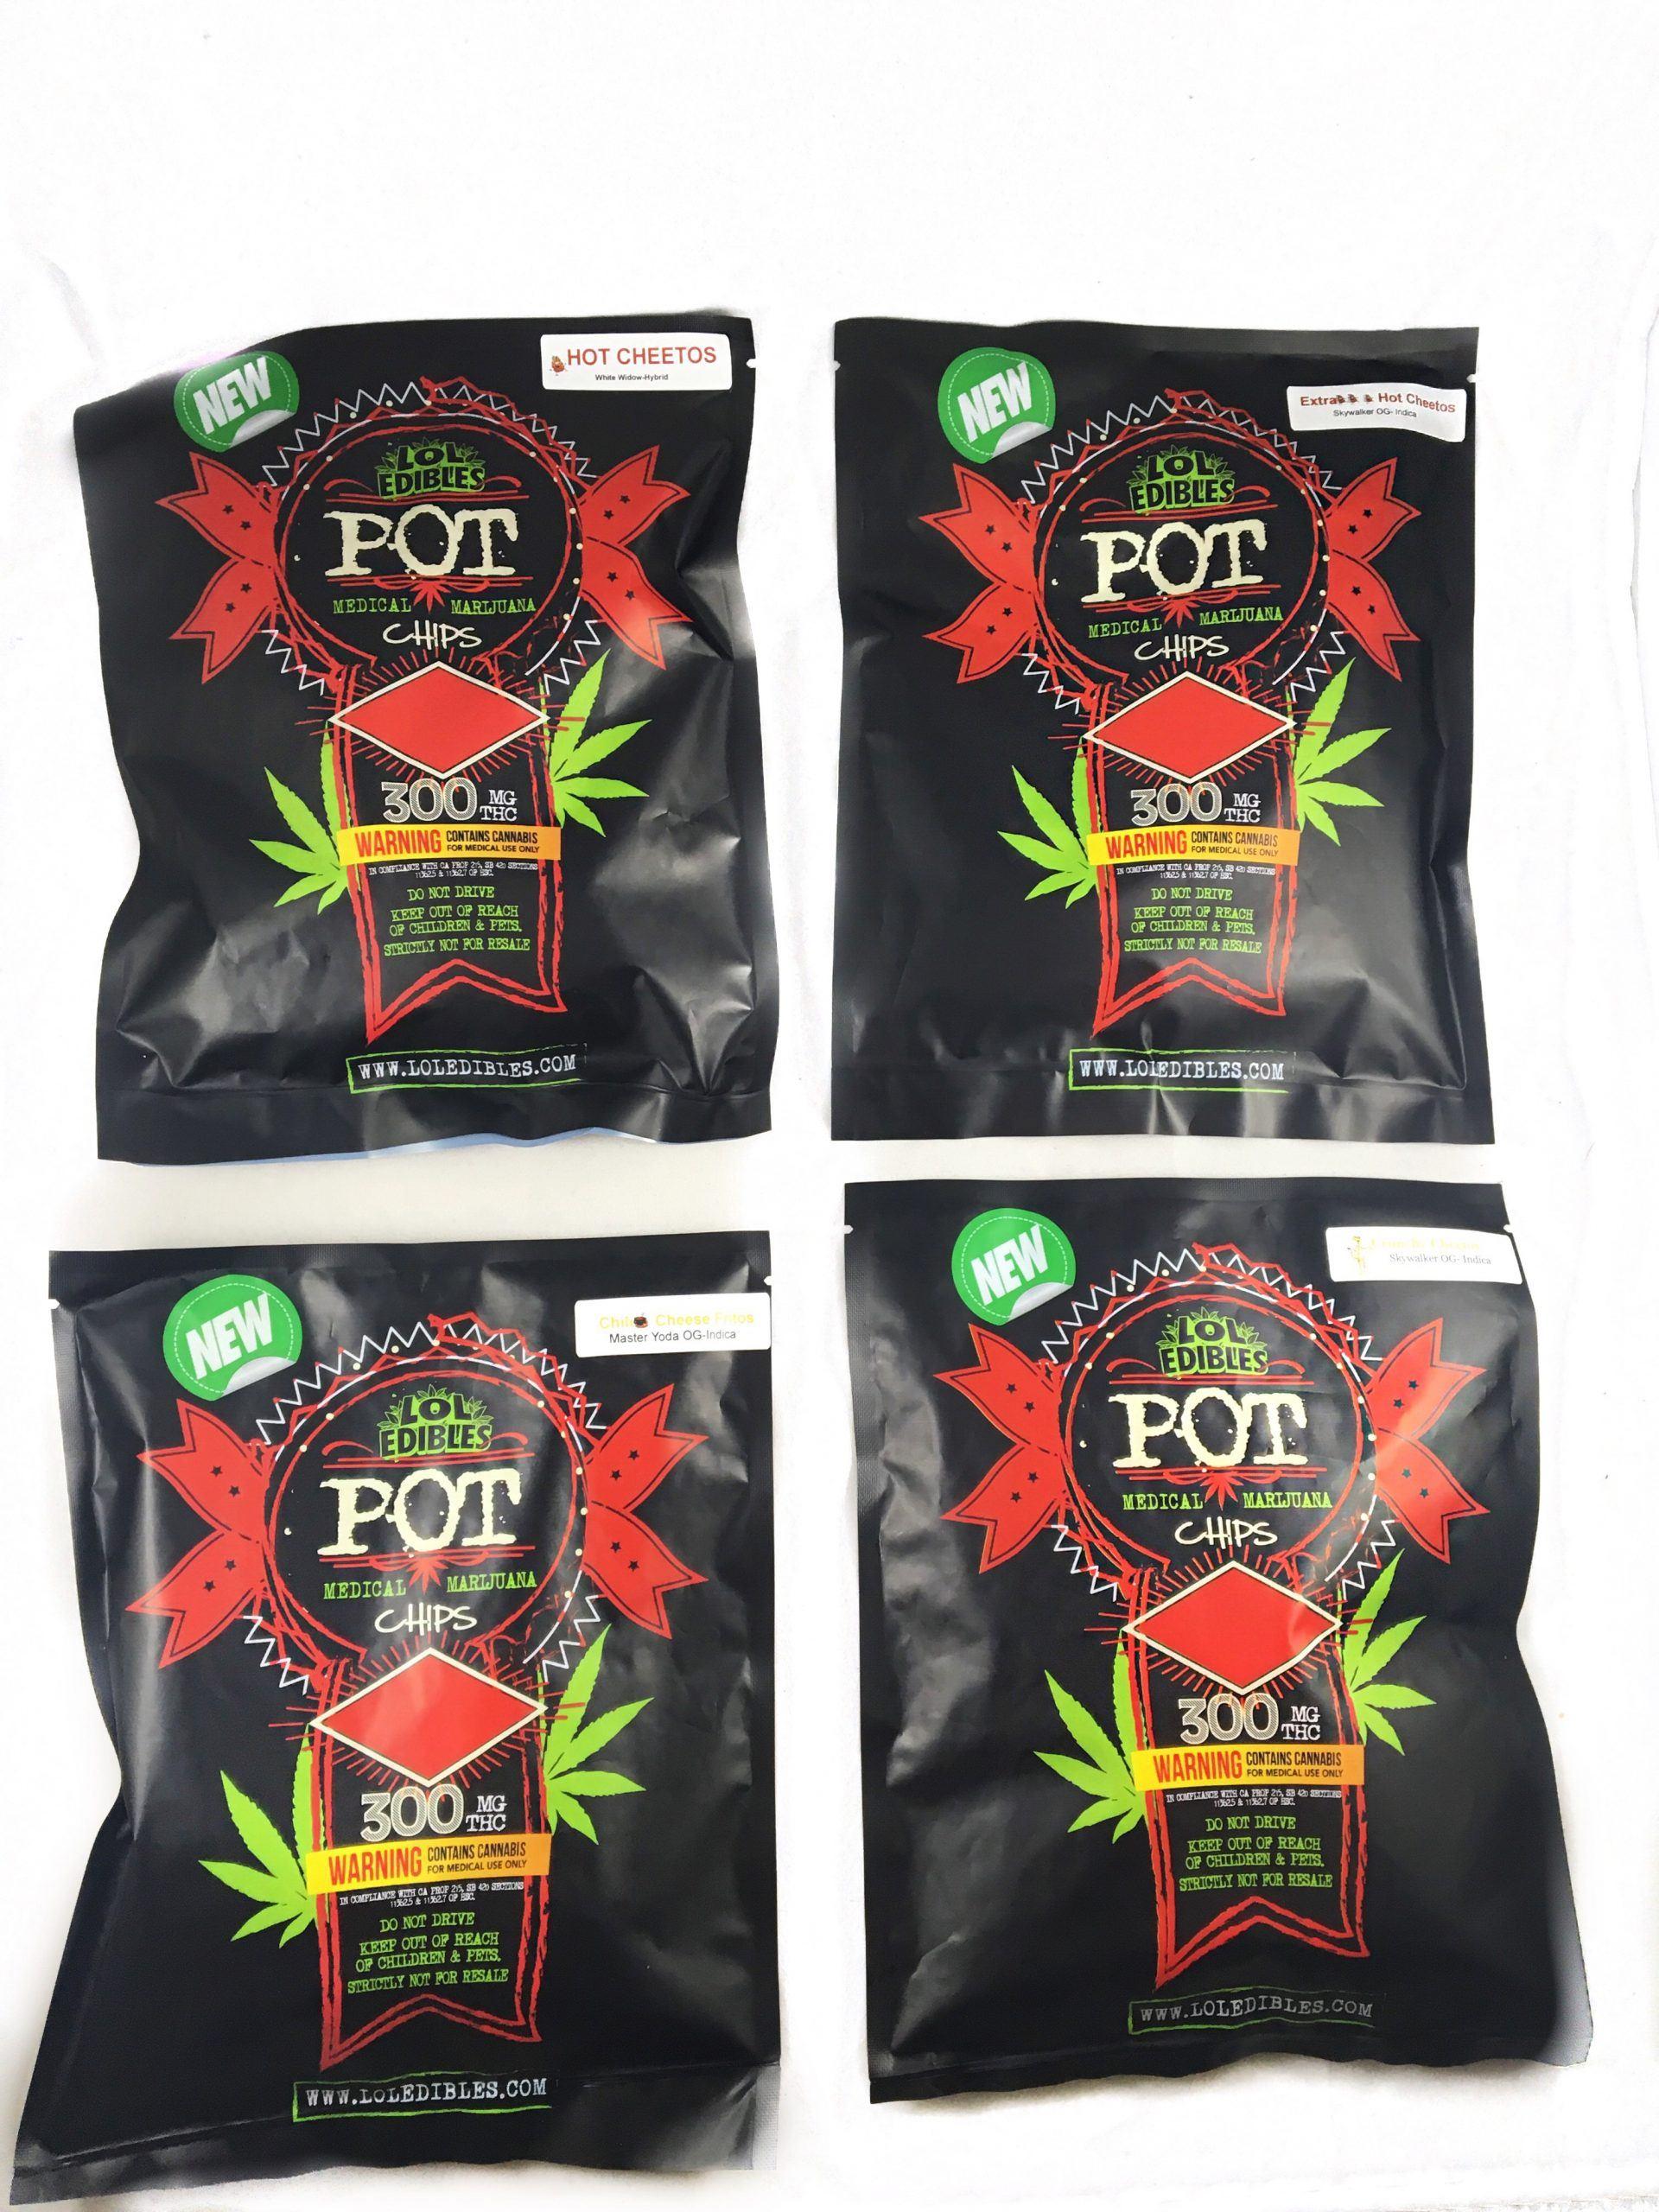 LOL edibles pot chips